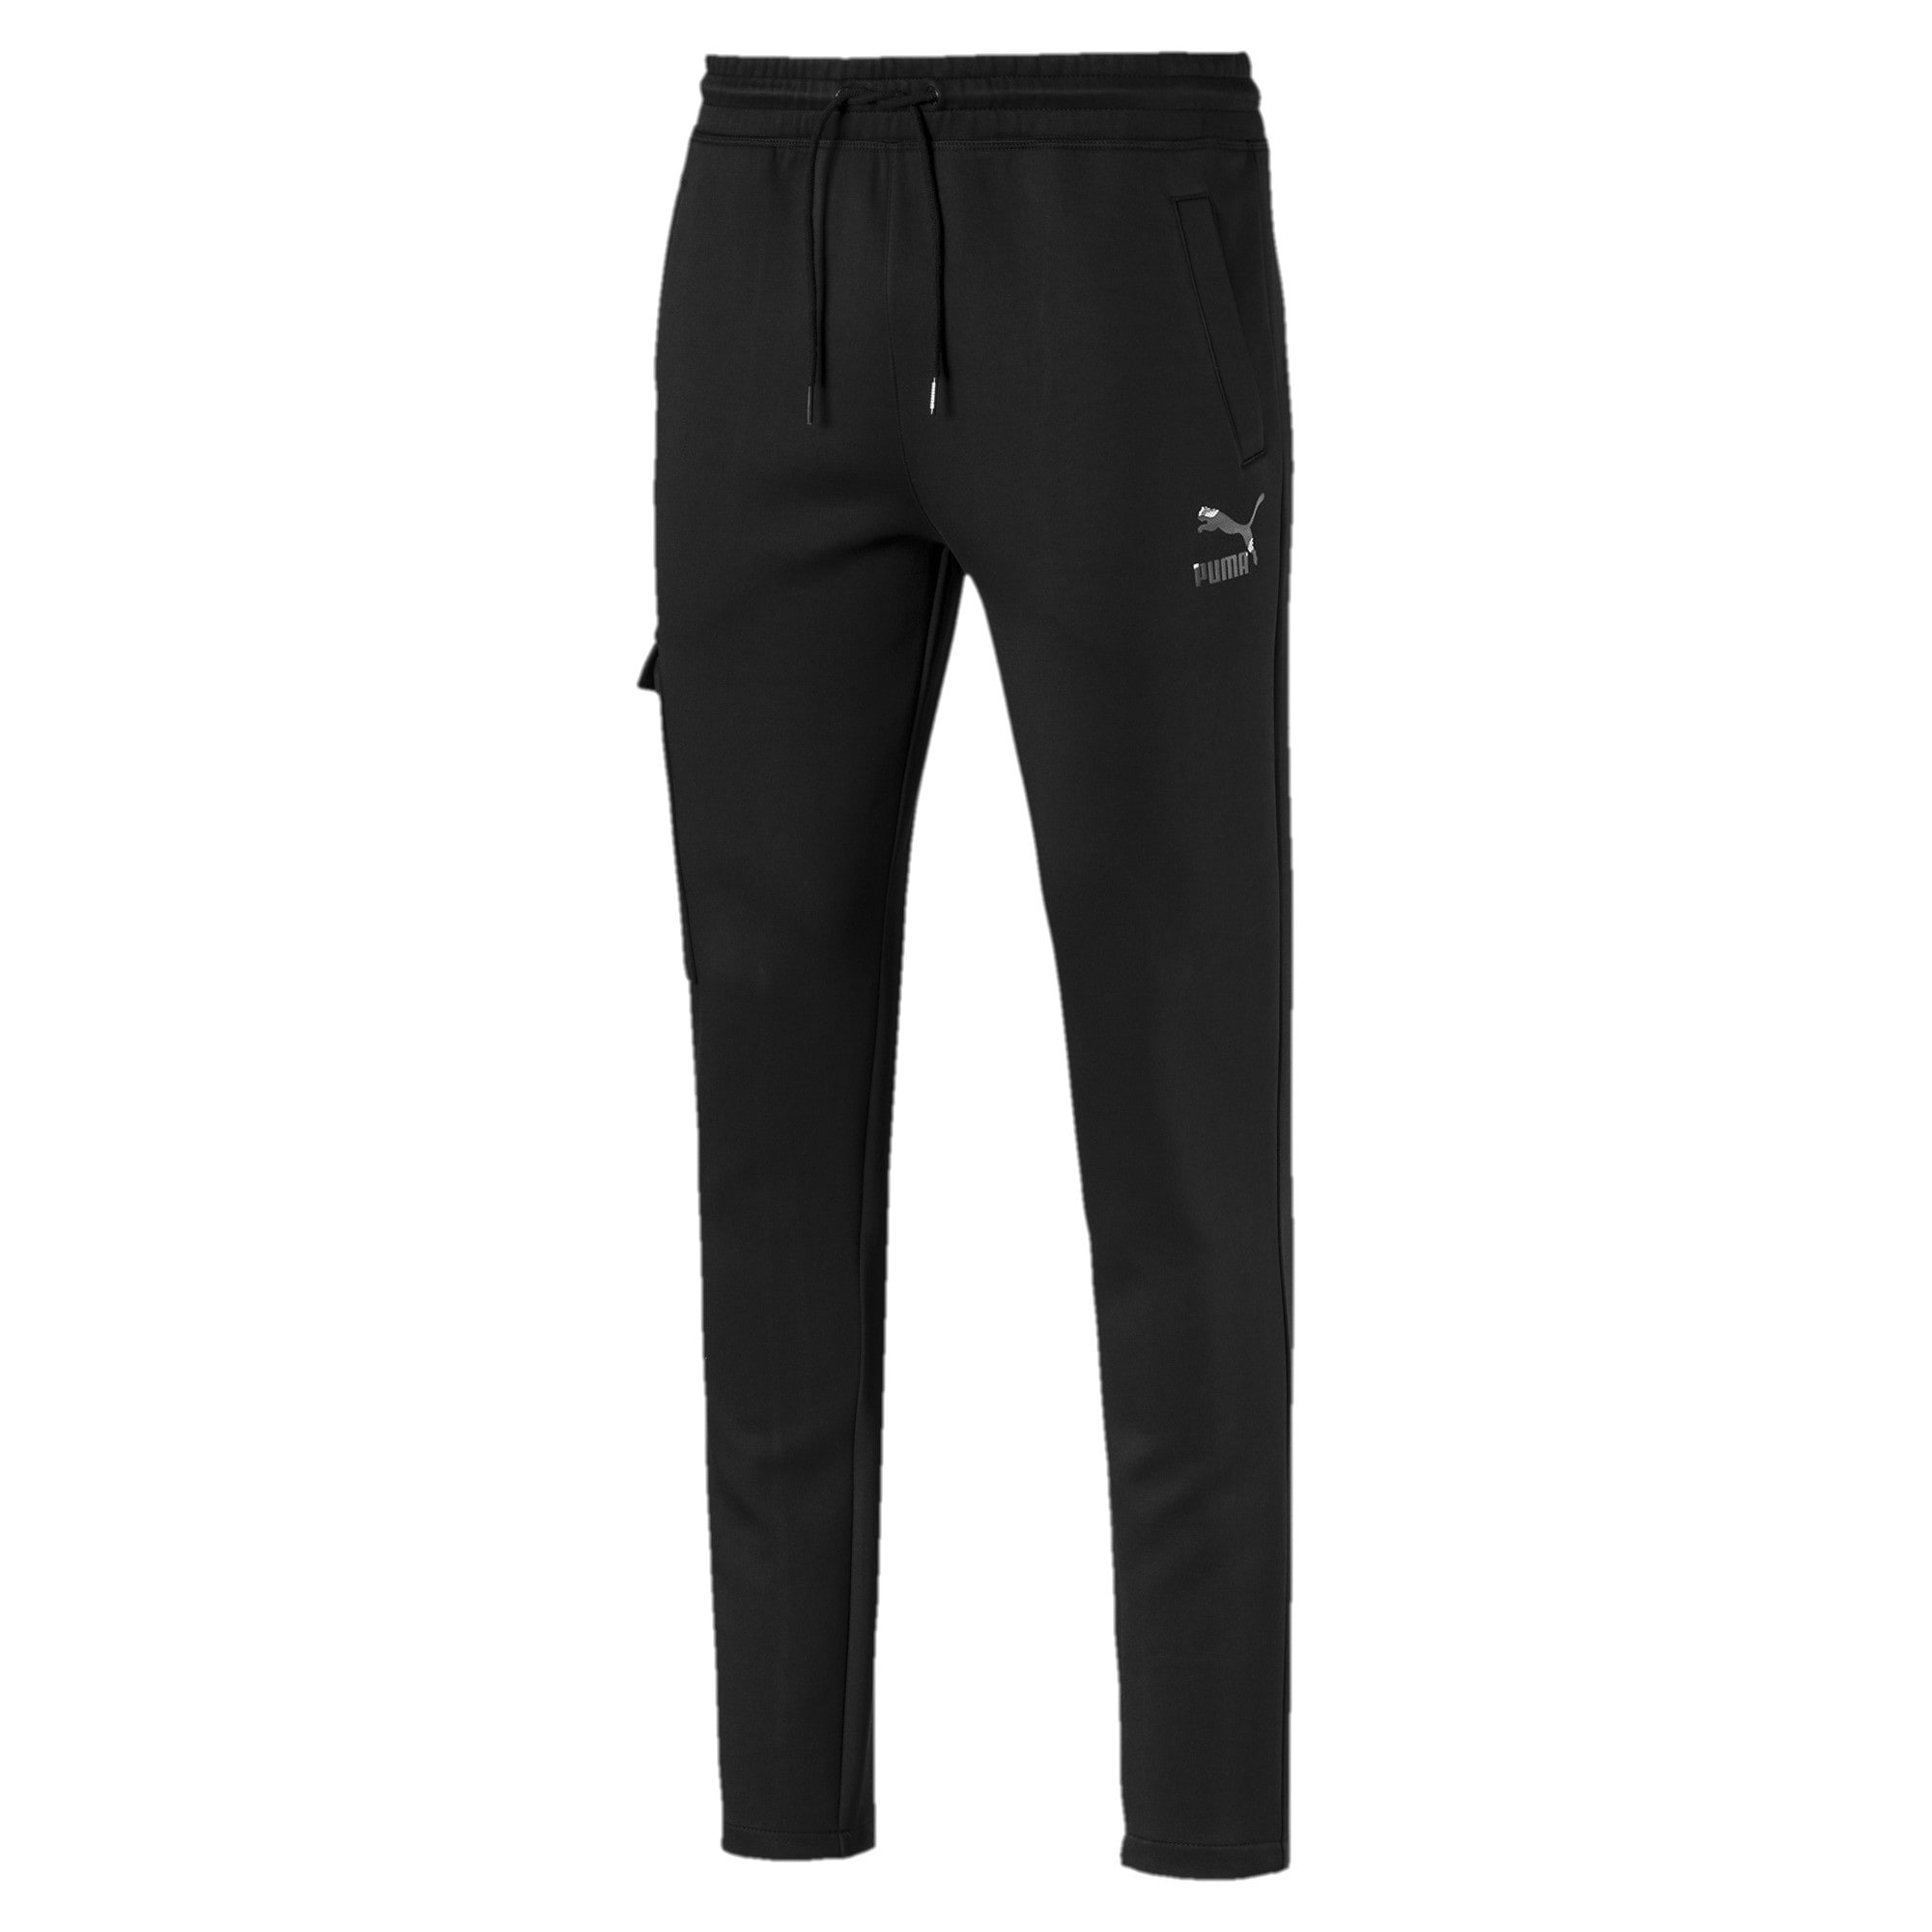 Thumbnail 1 of Classics Men's Open Hem Pants, Cotton Black, medium